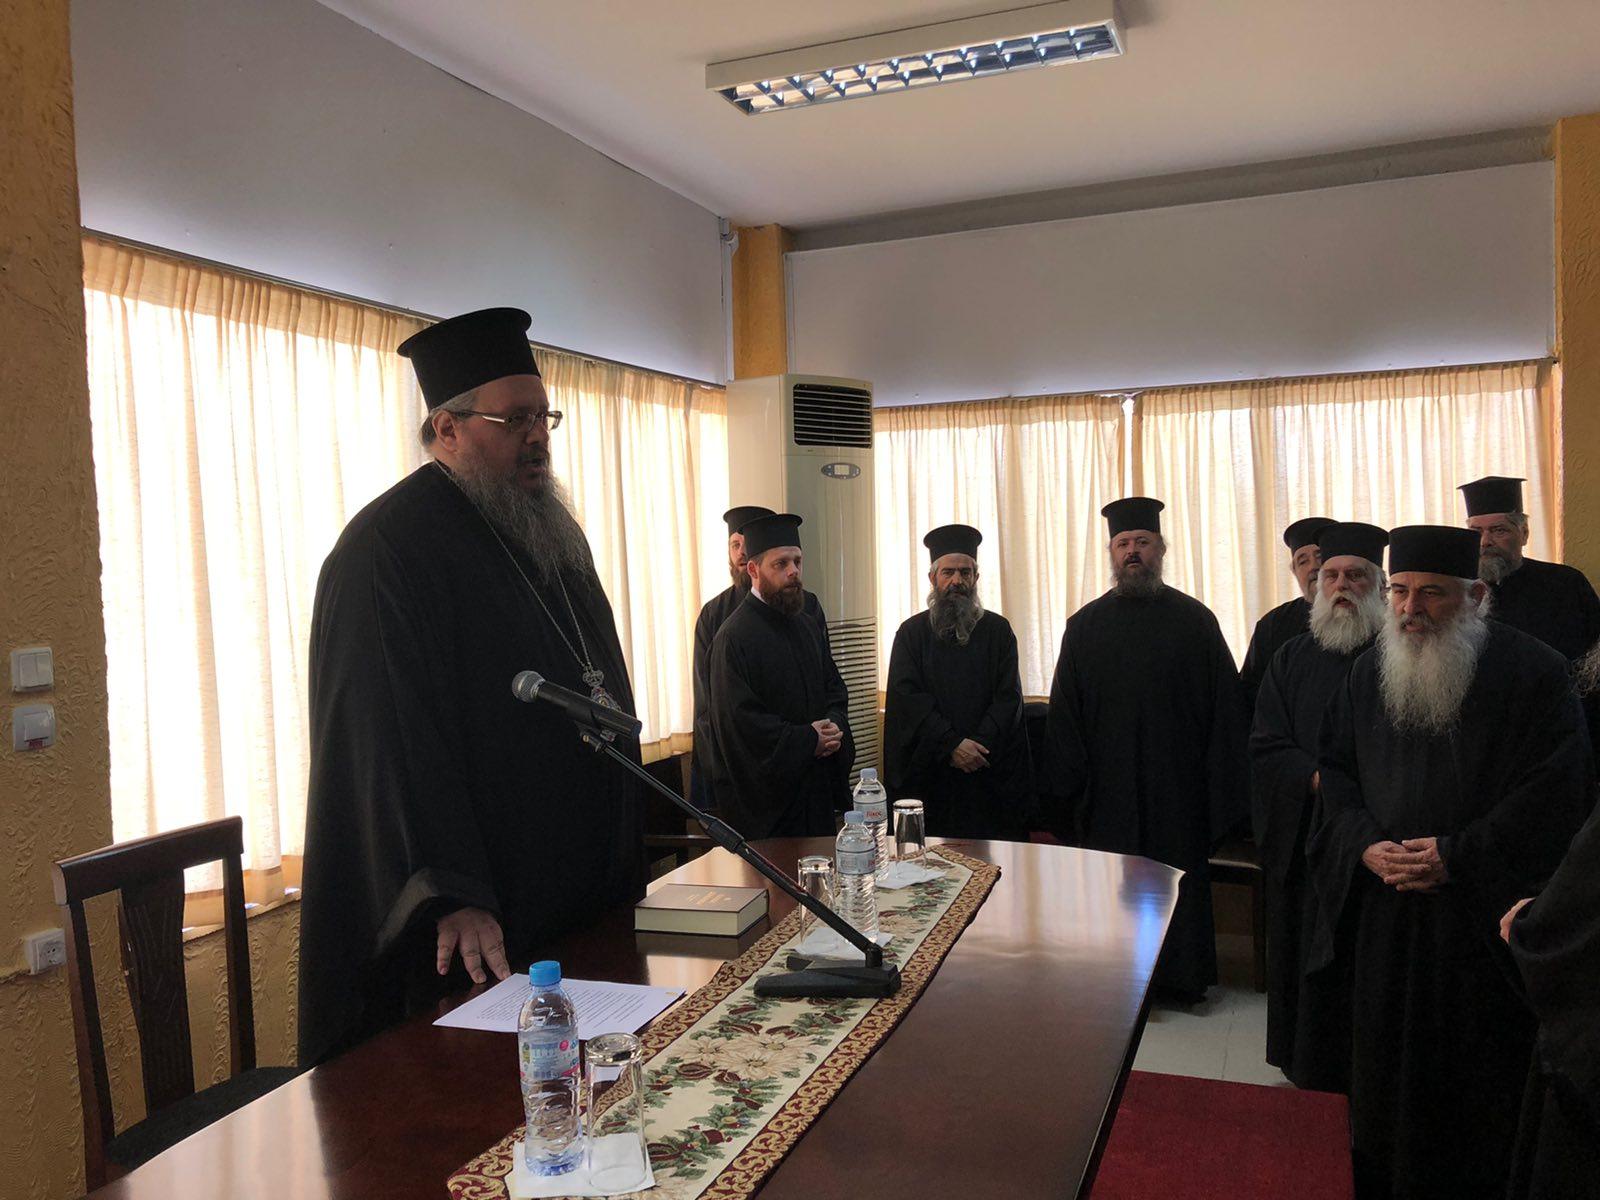 synaksi febrouariou 1 - Ιερατική Σύναξη στο Μελισσοχώρι (φωτο)